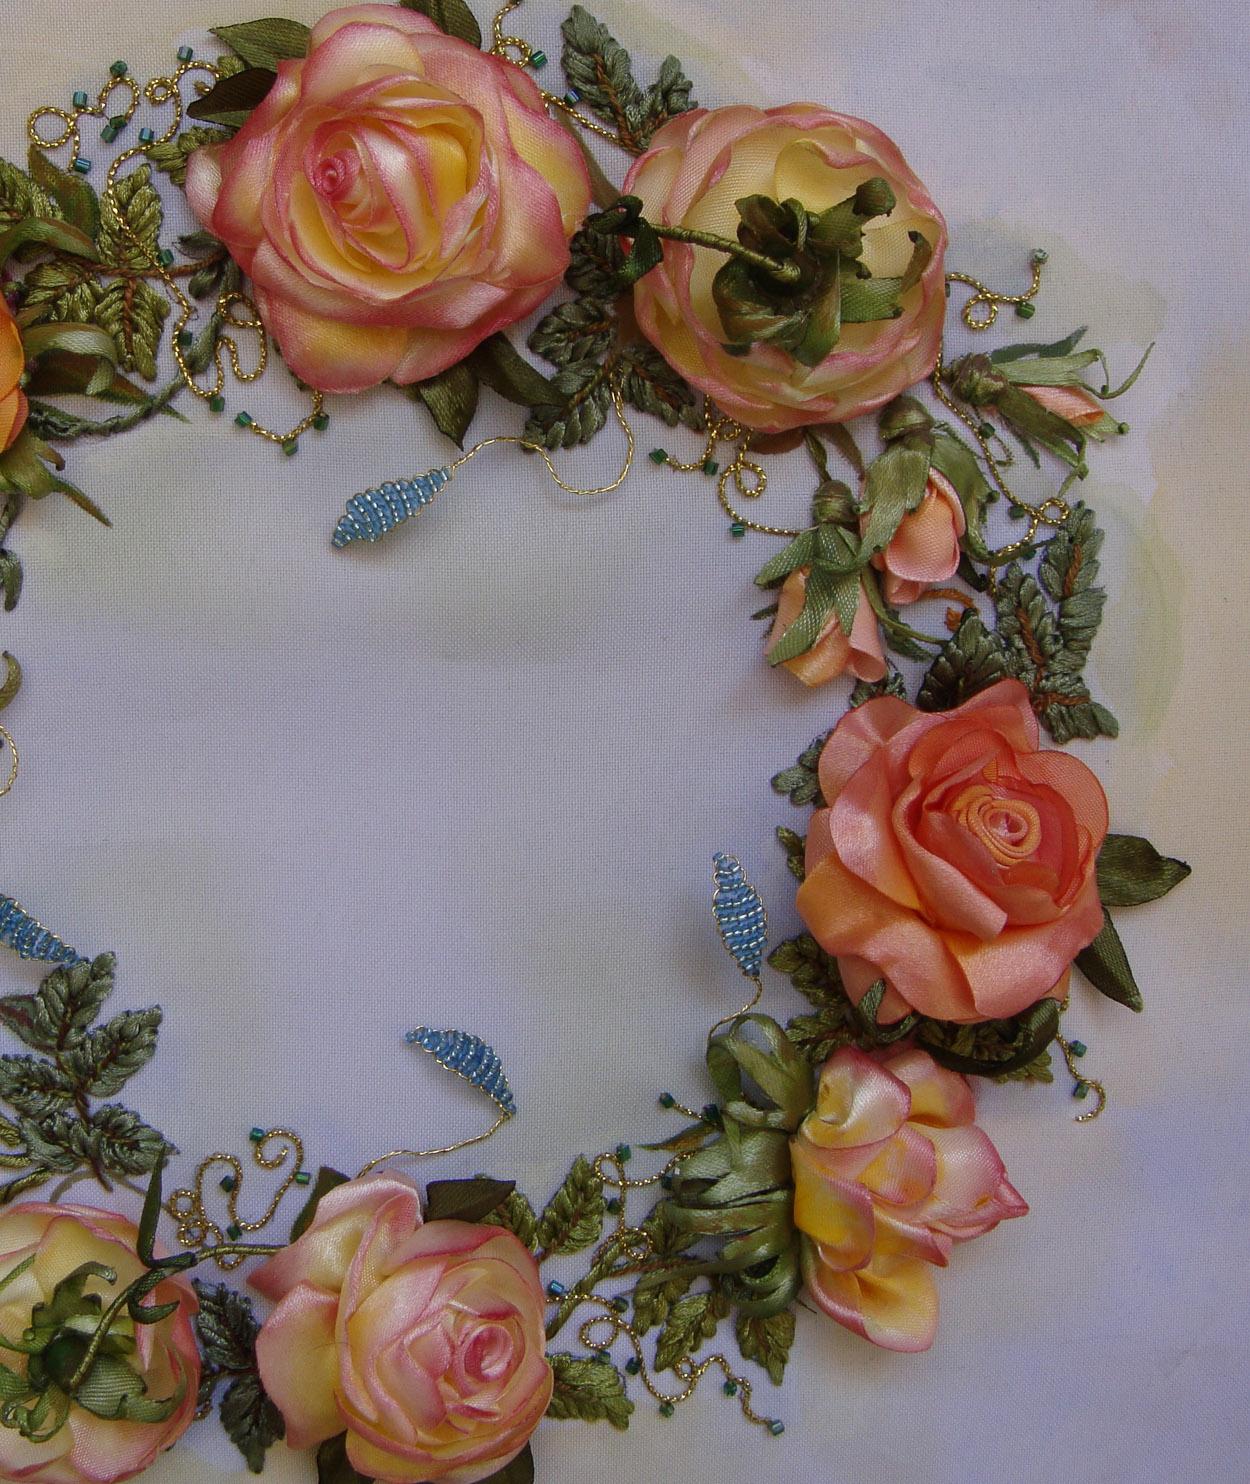 Maryam-Kiaee-roses2